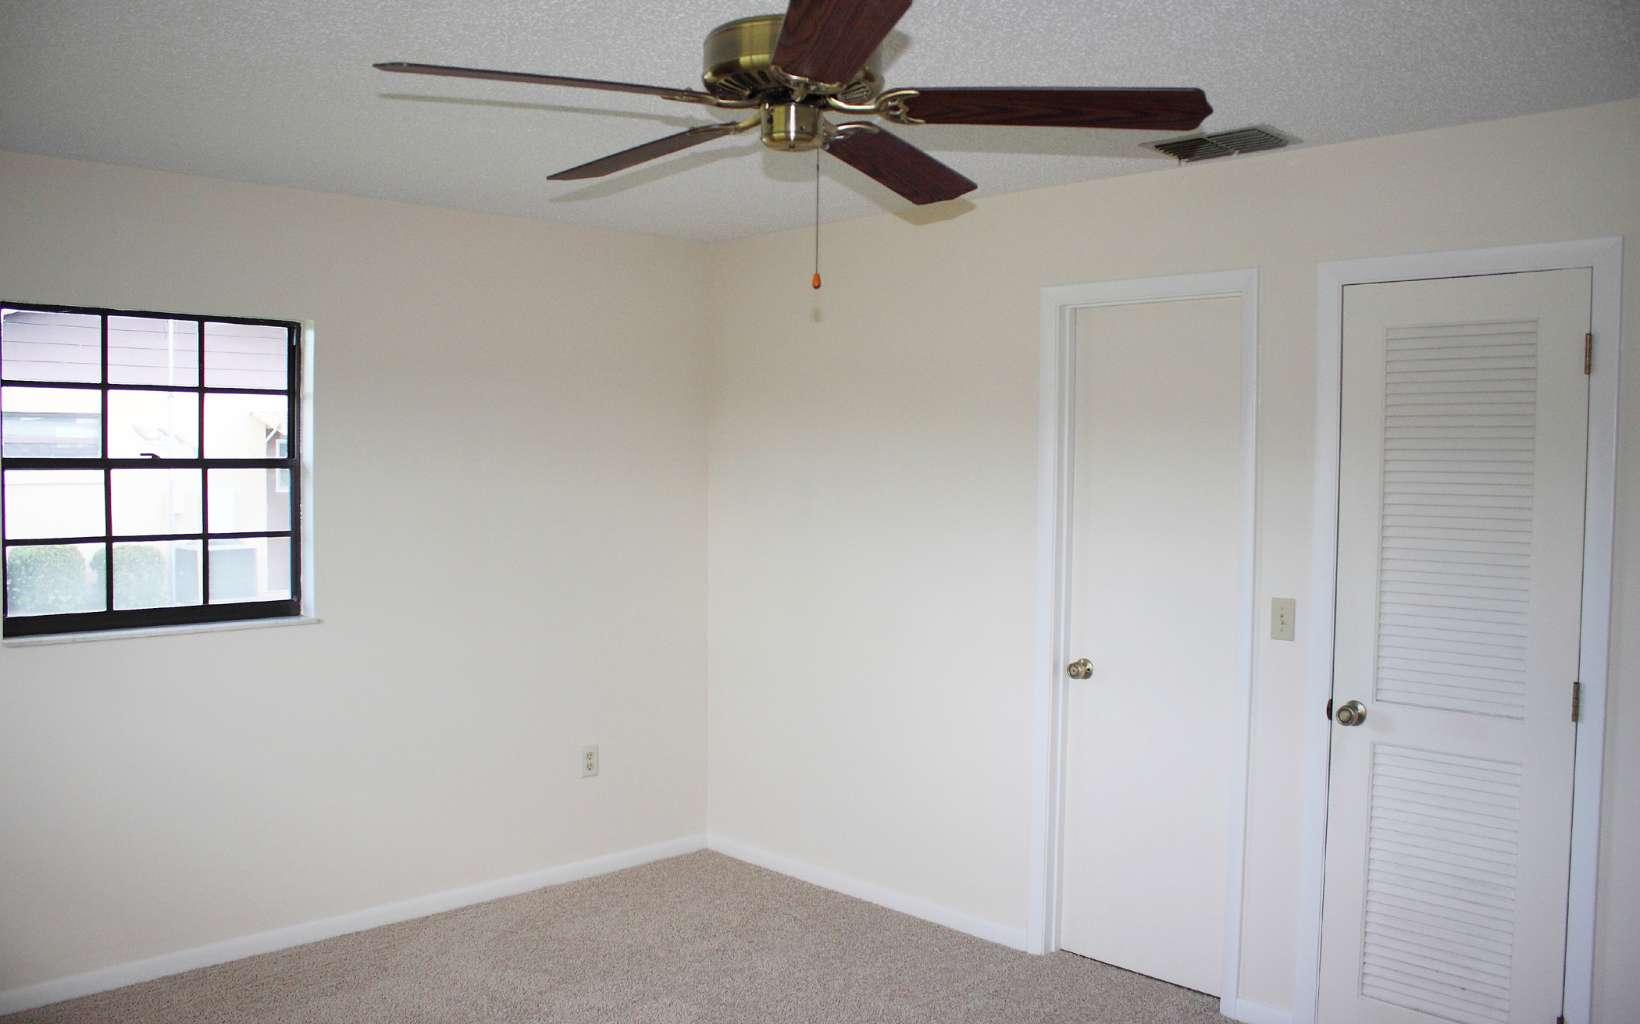 144 Cumquat Rd Nw, Lake Placid, FL 33852